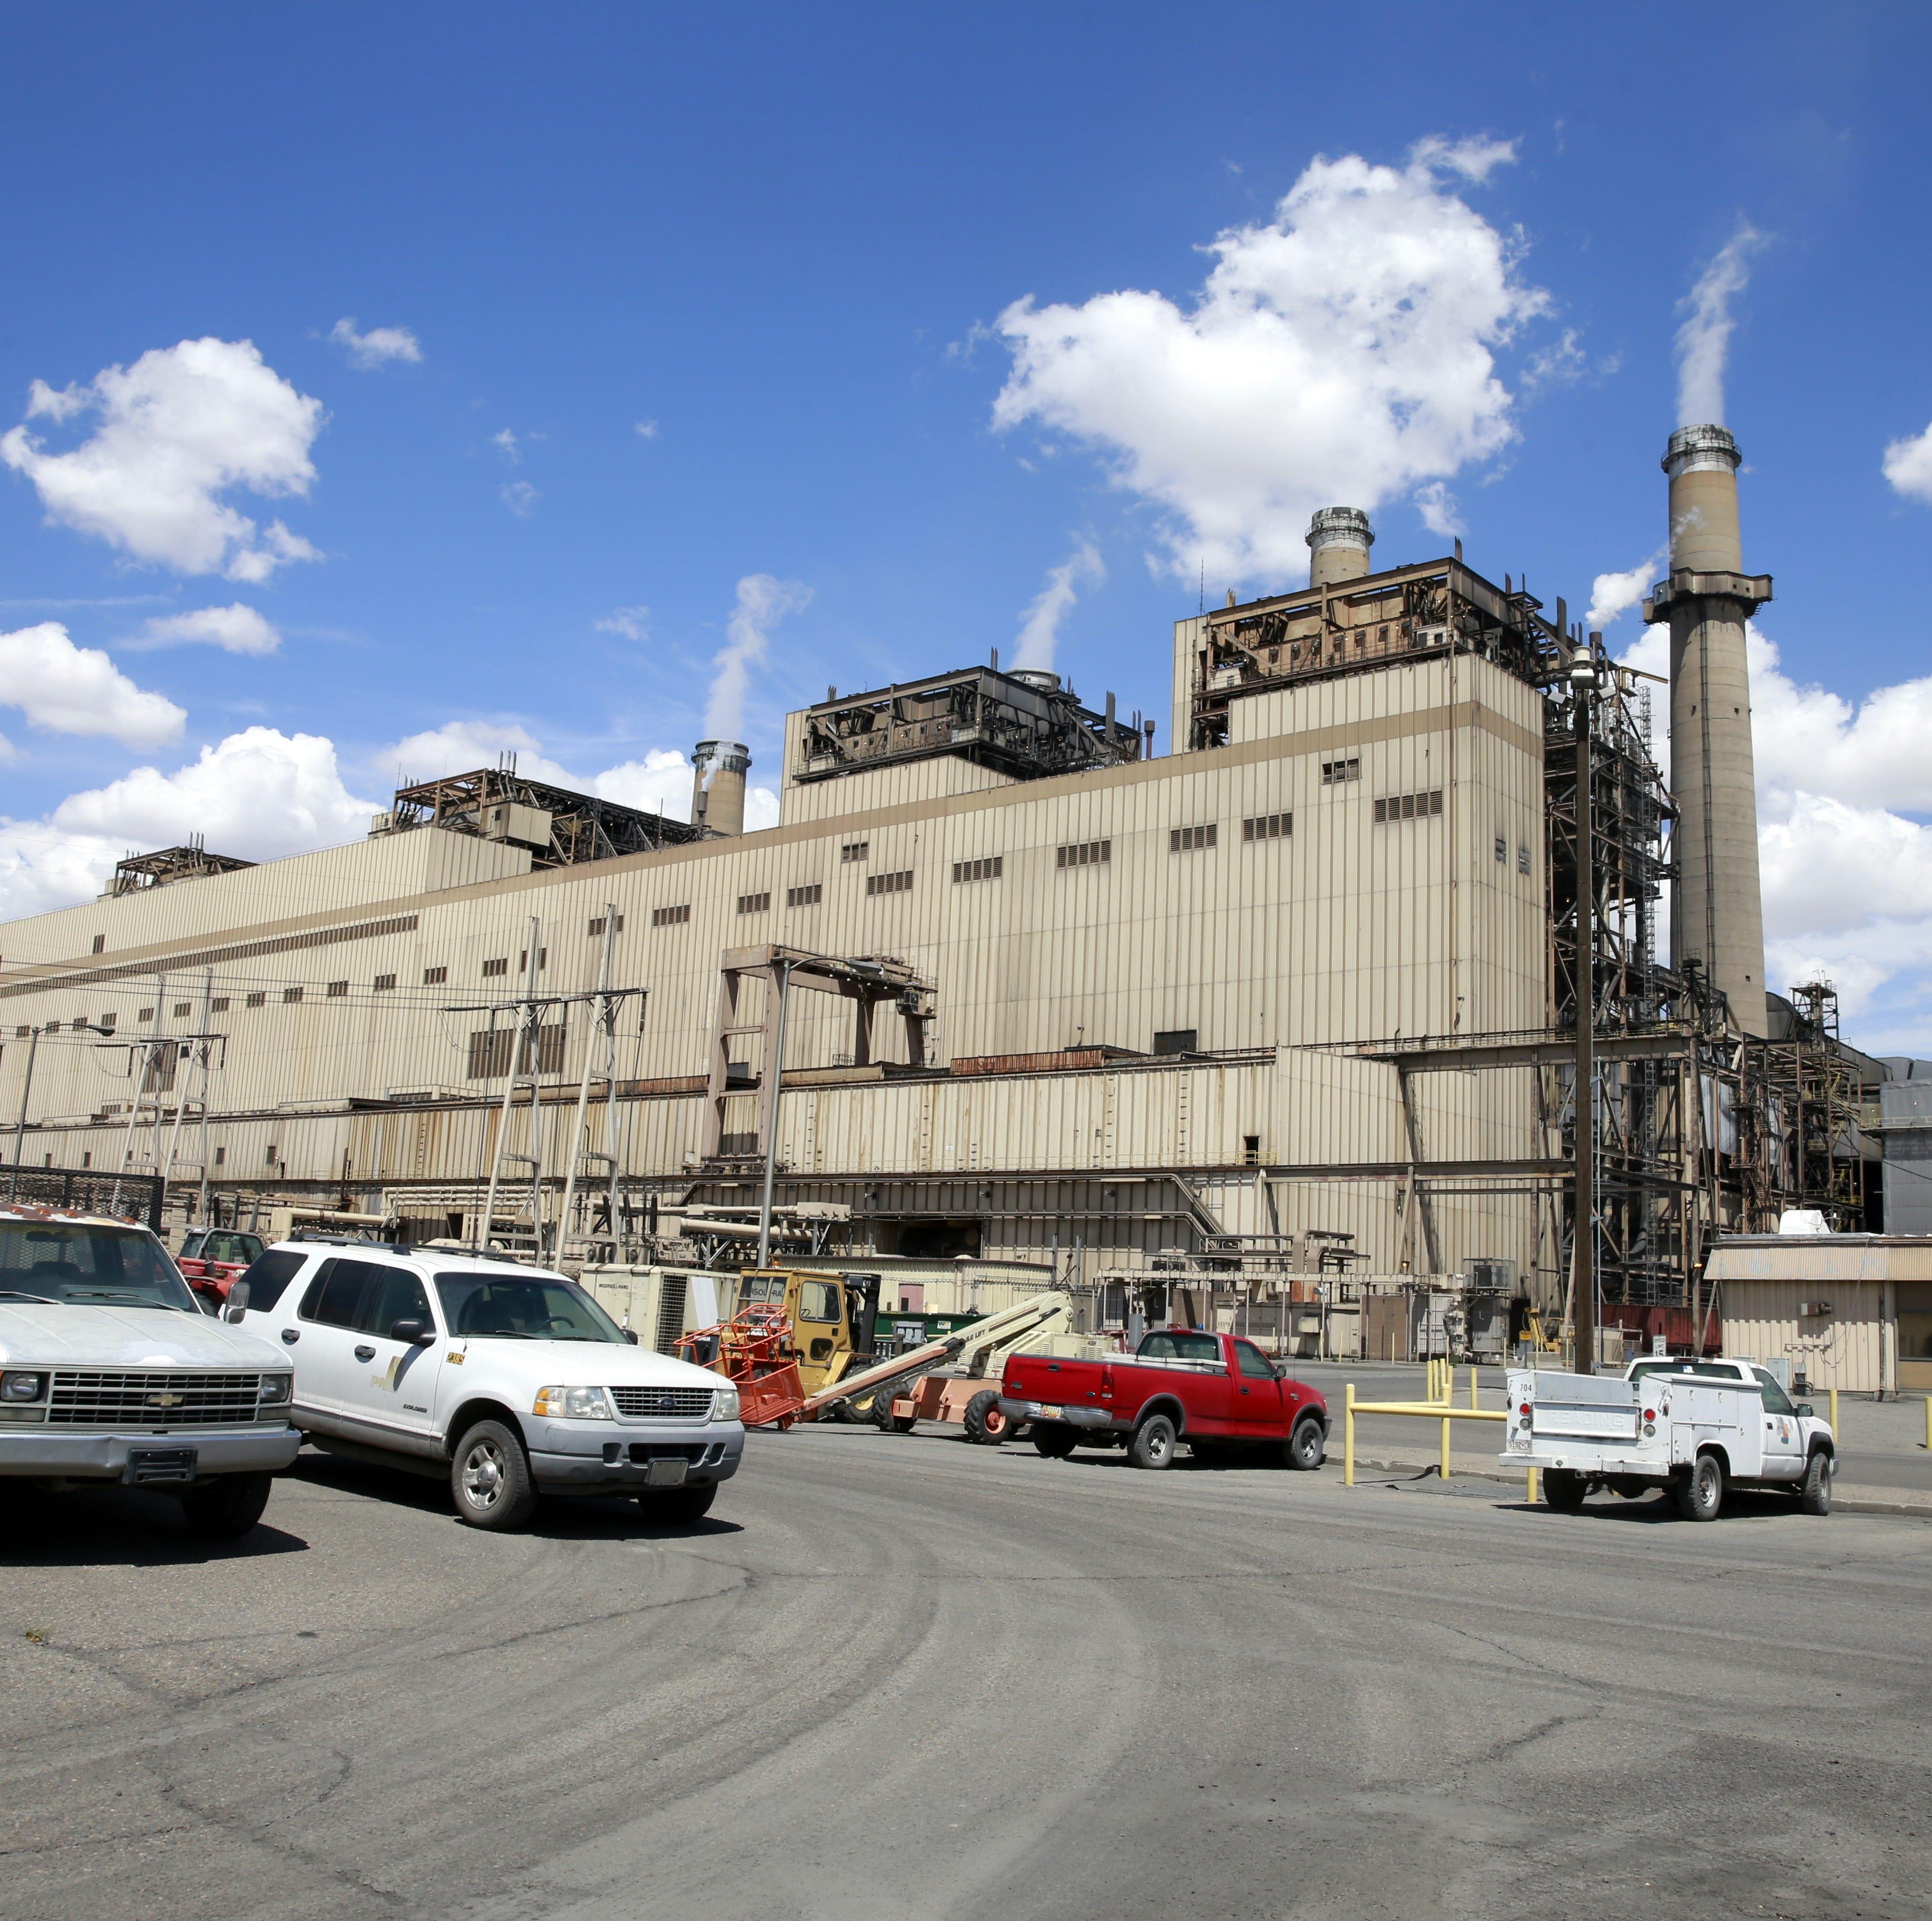 Bill focused on San Juan Generating Station closure passes Senate following Sharer's filibuster